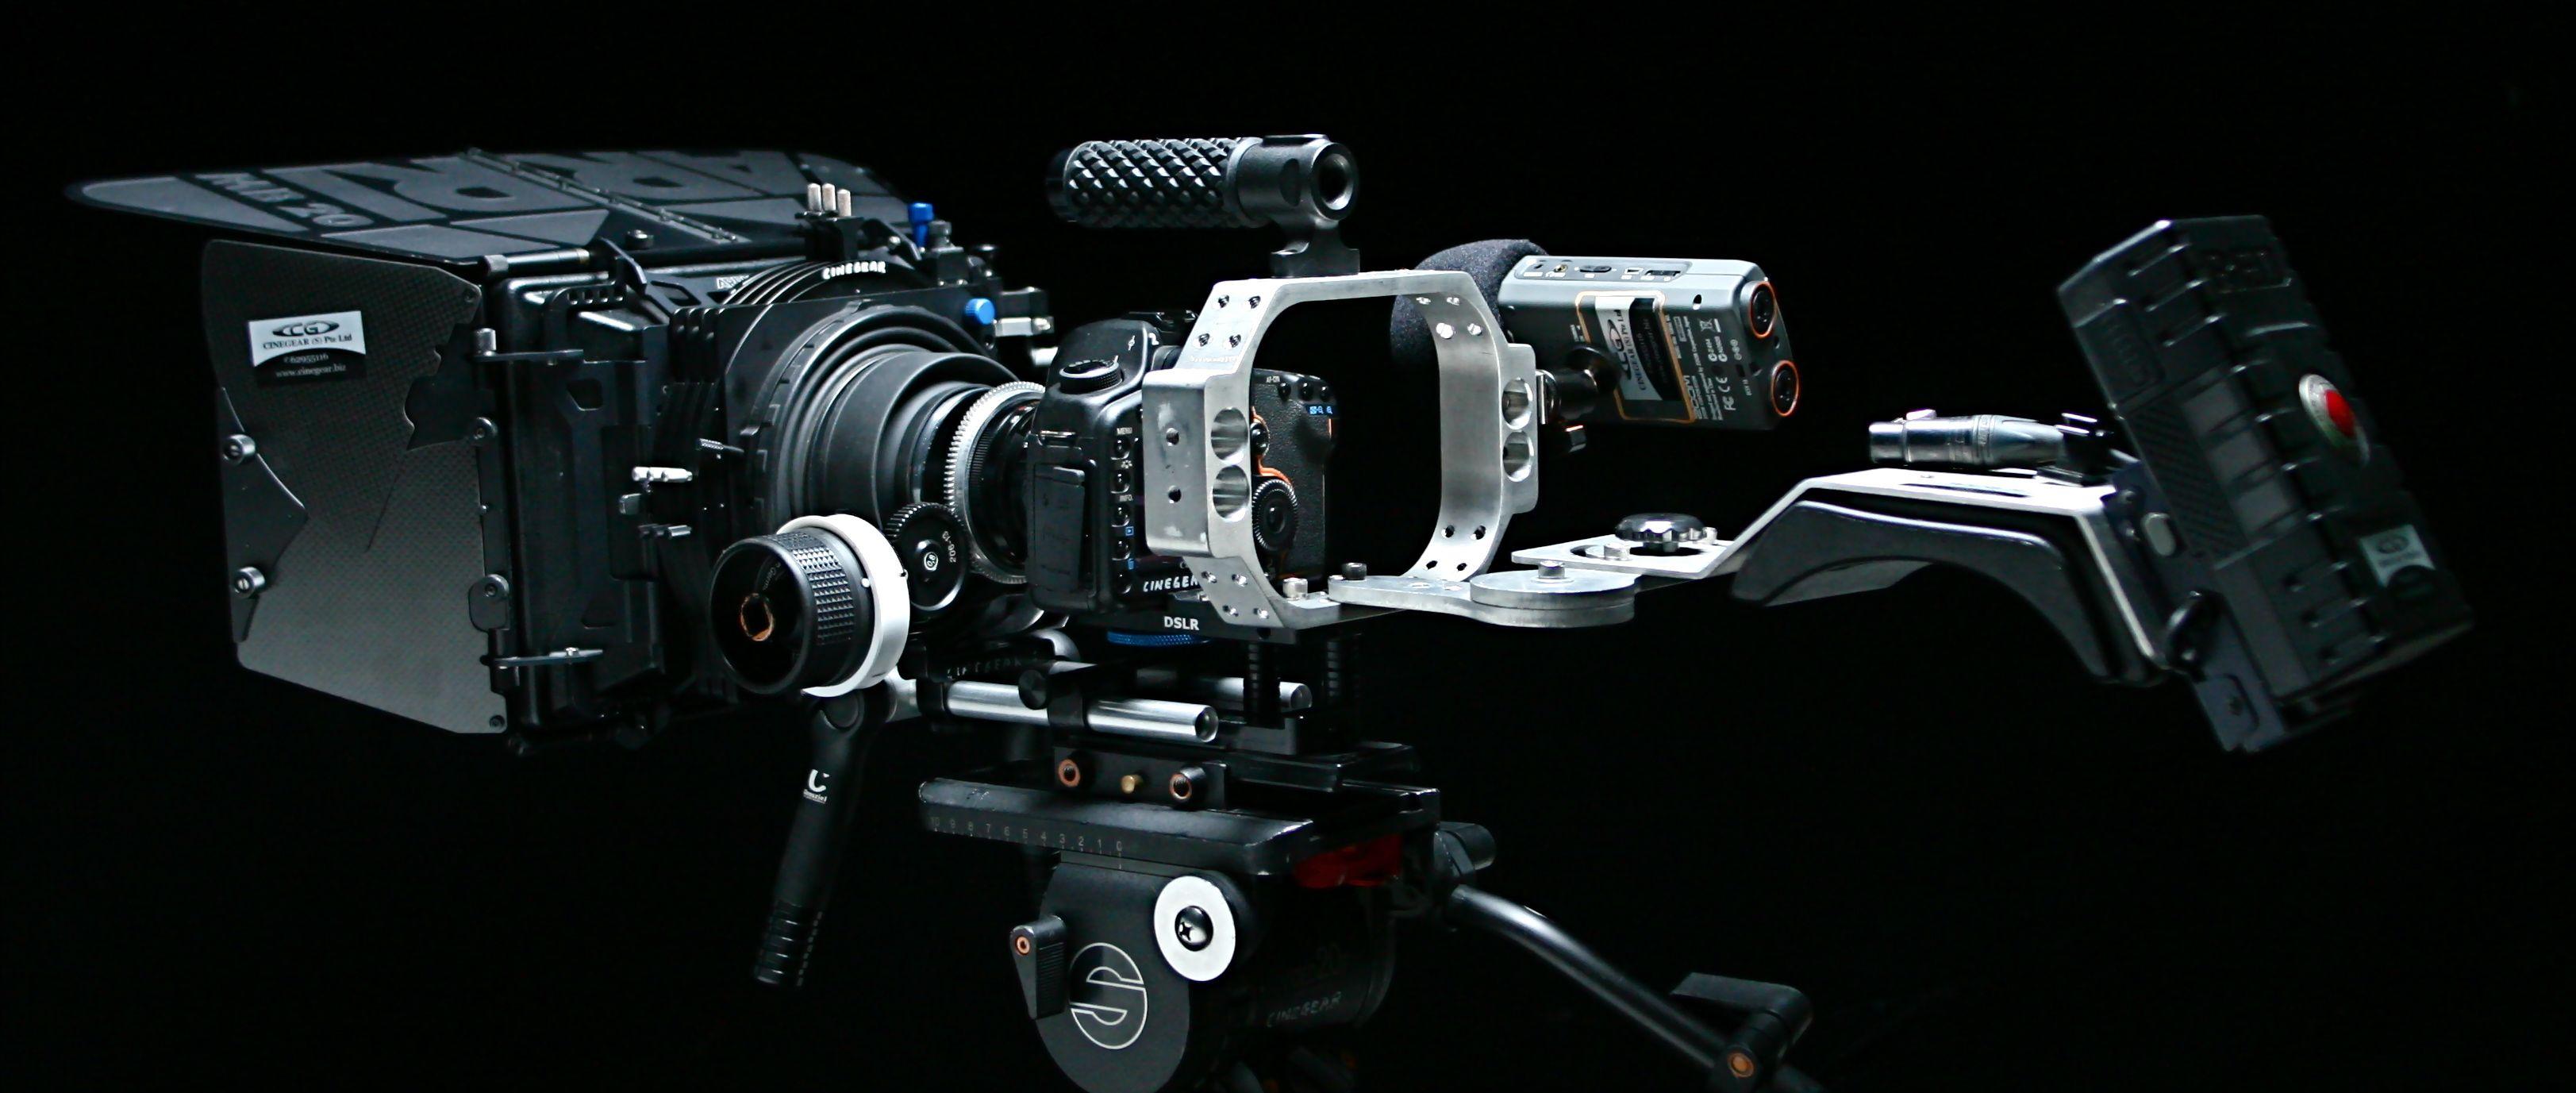 Camera Camera Dslr Rig pinterest the worlds catalog of ideas crazy dslr rig